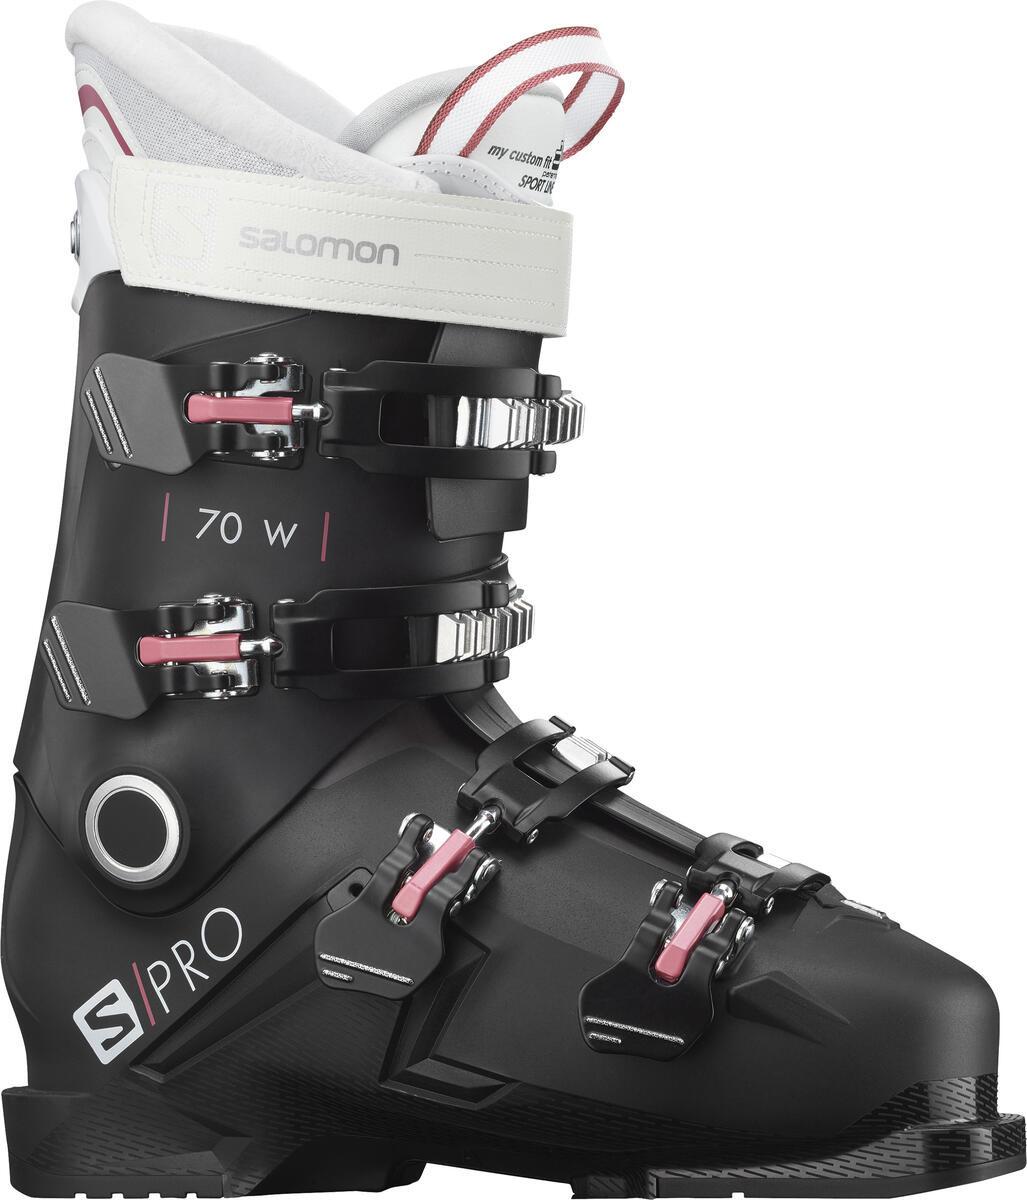 Salomon S_Pro 70 W 2021